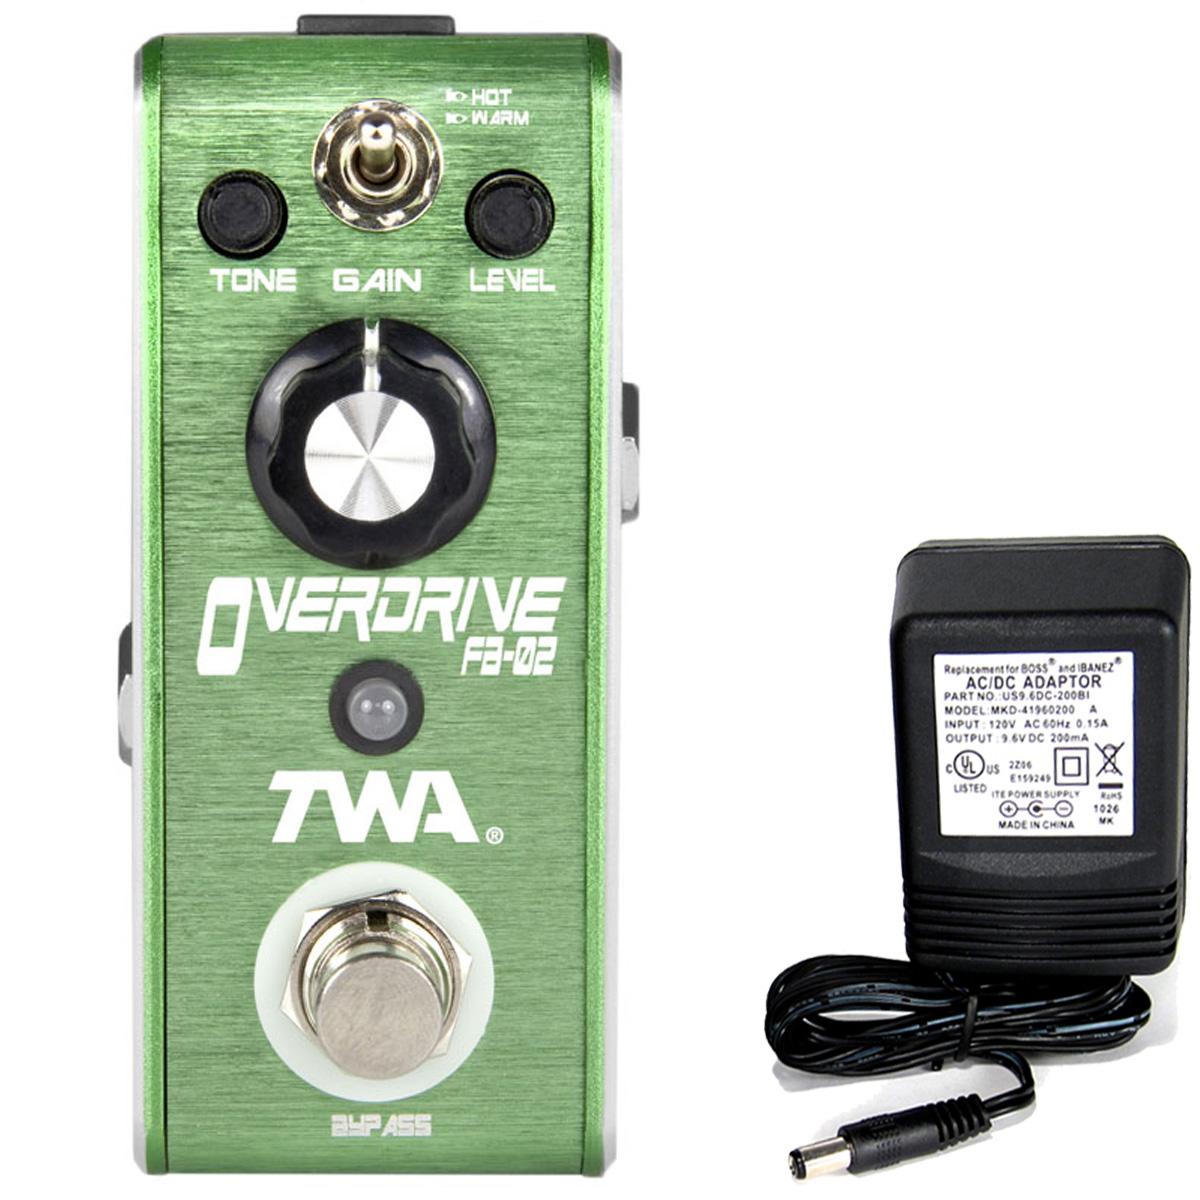 TWA Fly Boys FB-02 Overdrive pedal with C-BAT R 9v battery clip & 9v AC supply